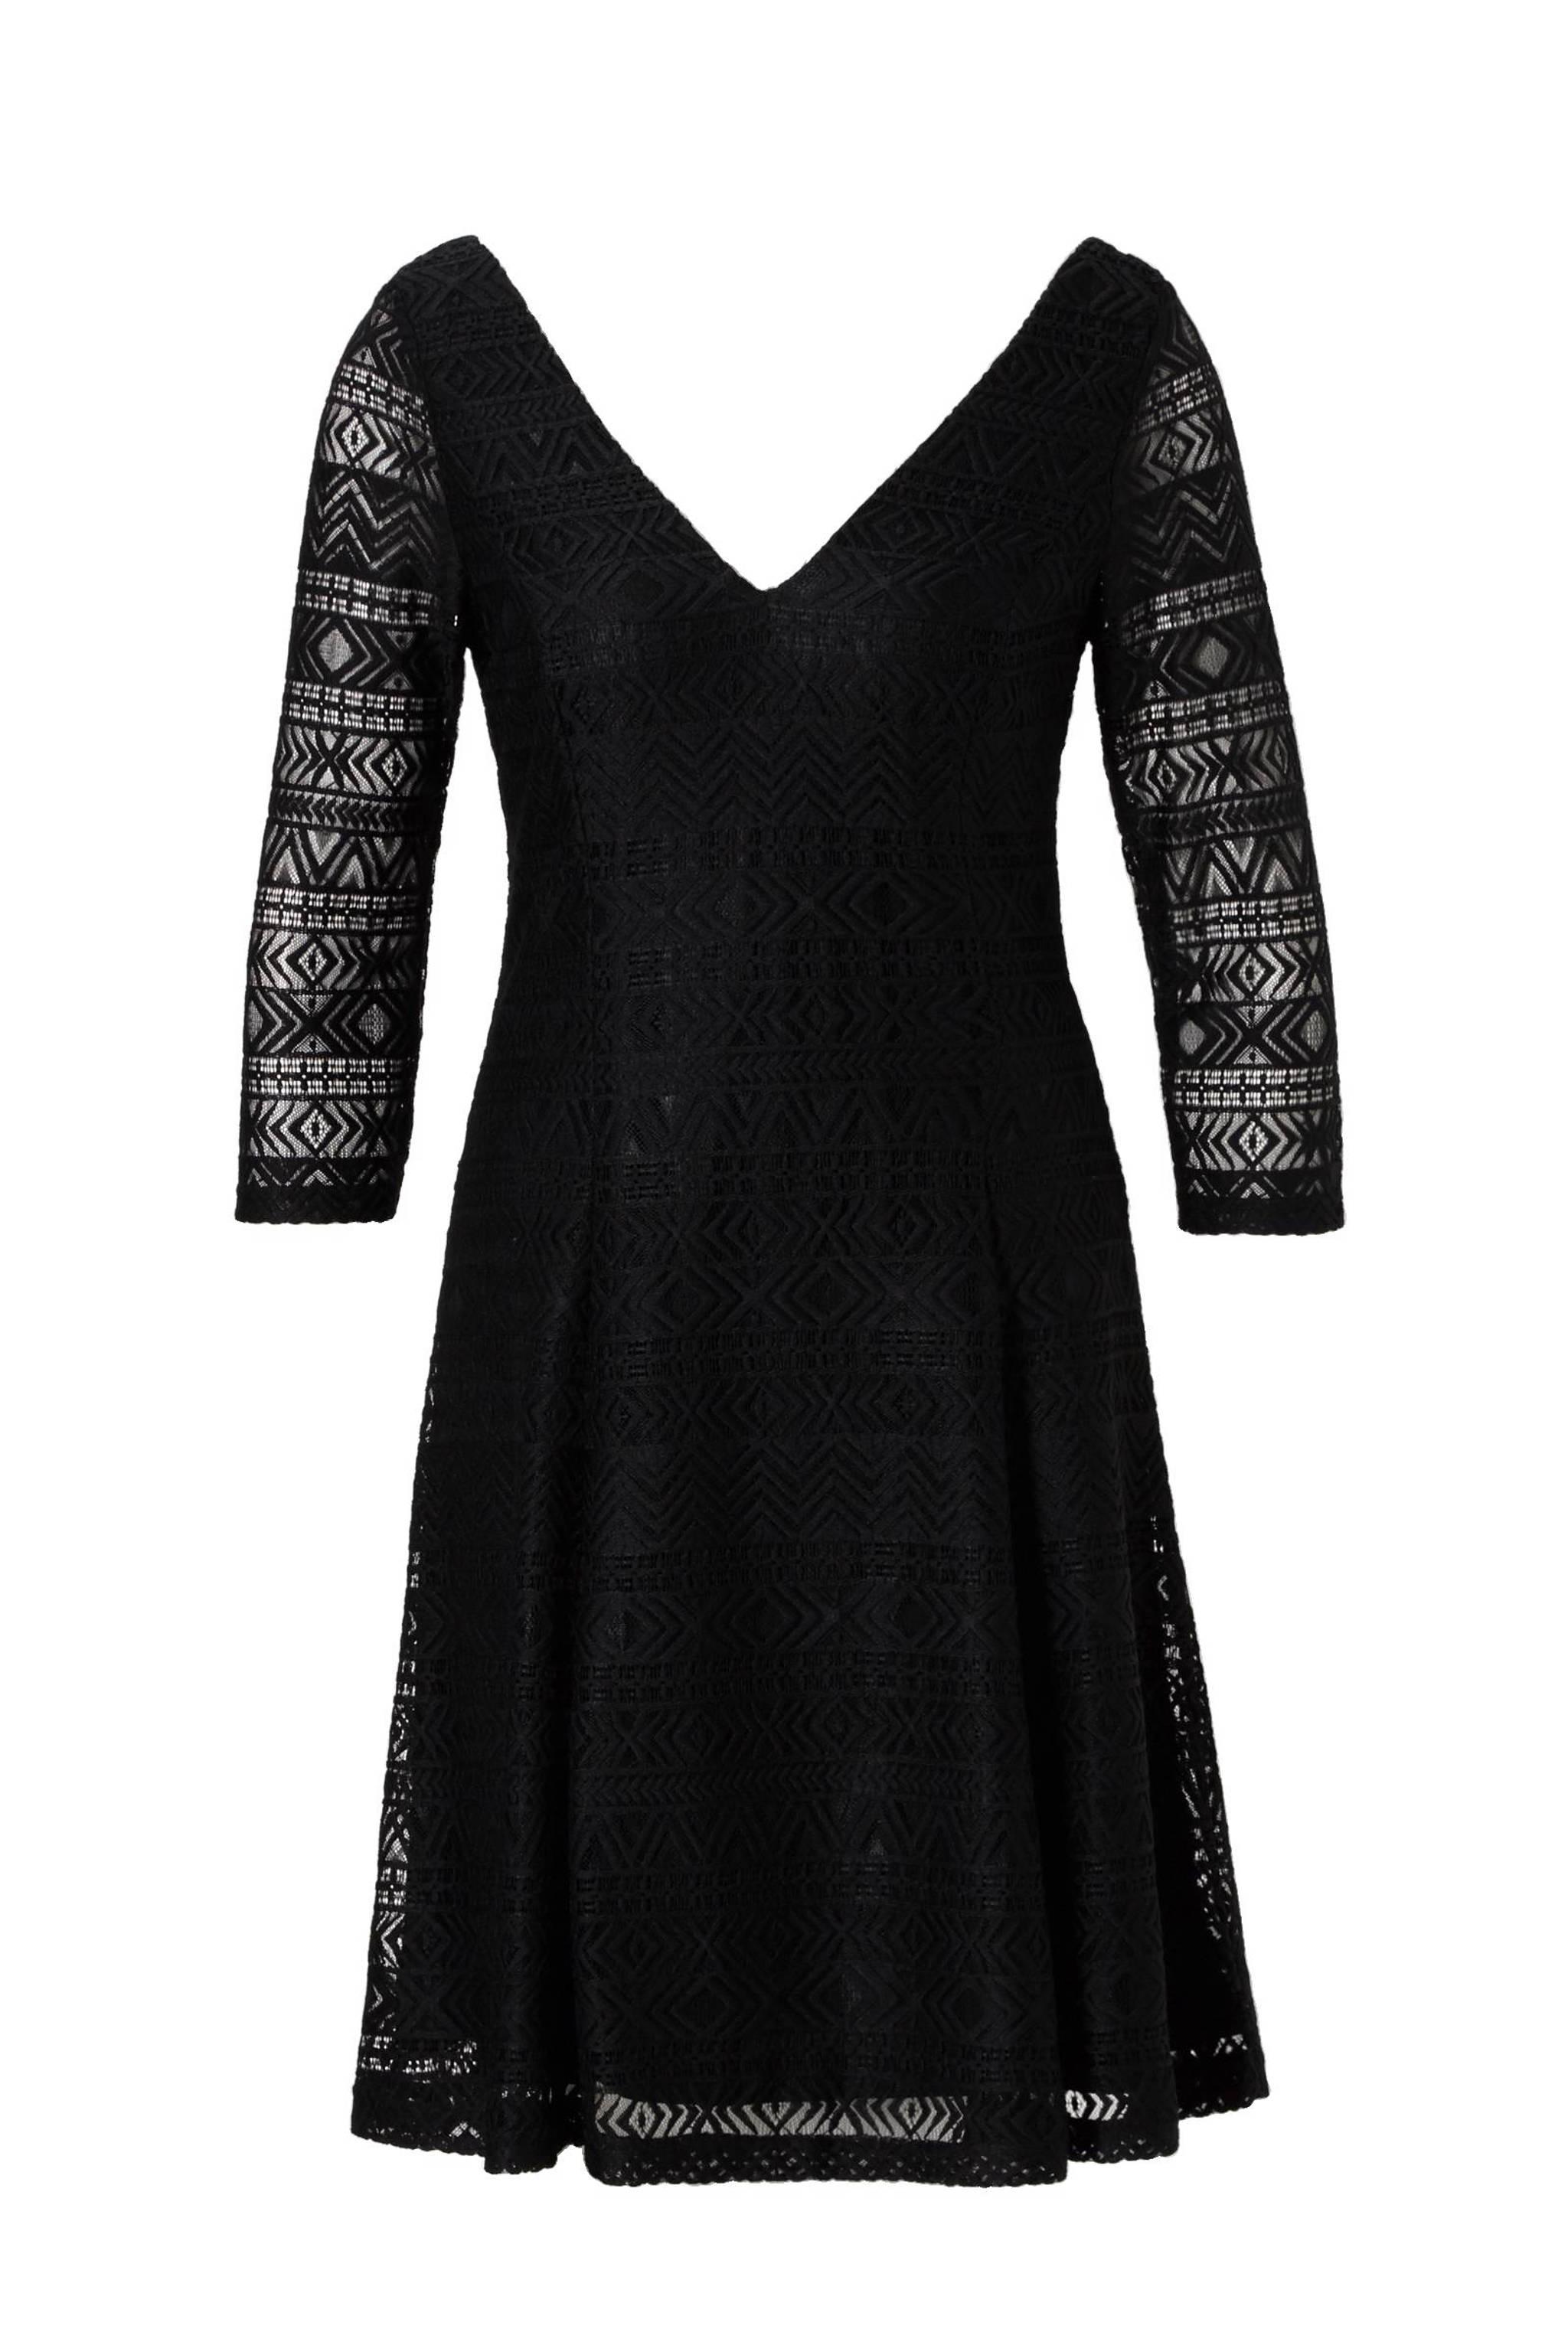 ad2f44ebe83da6 ESPRIT Women Casual kanten jurk